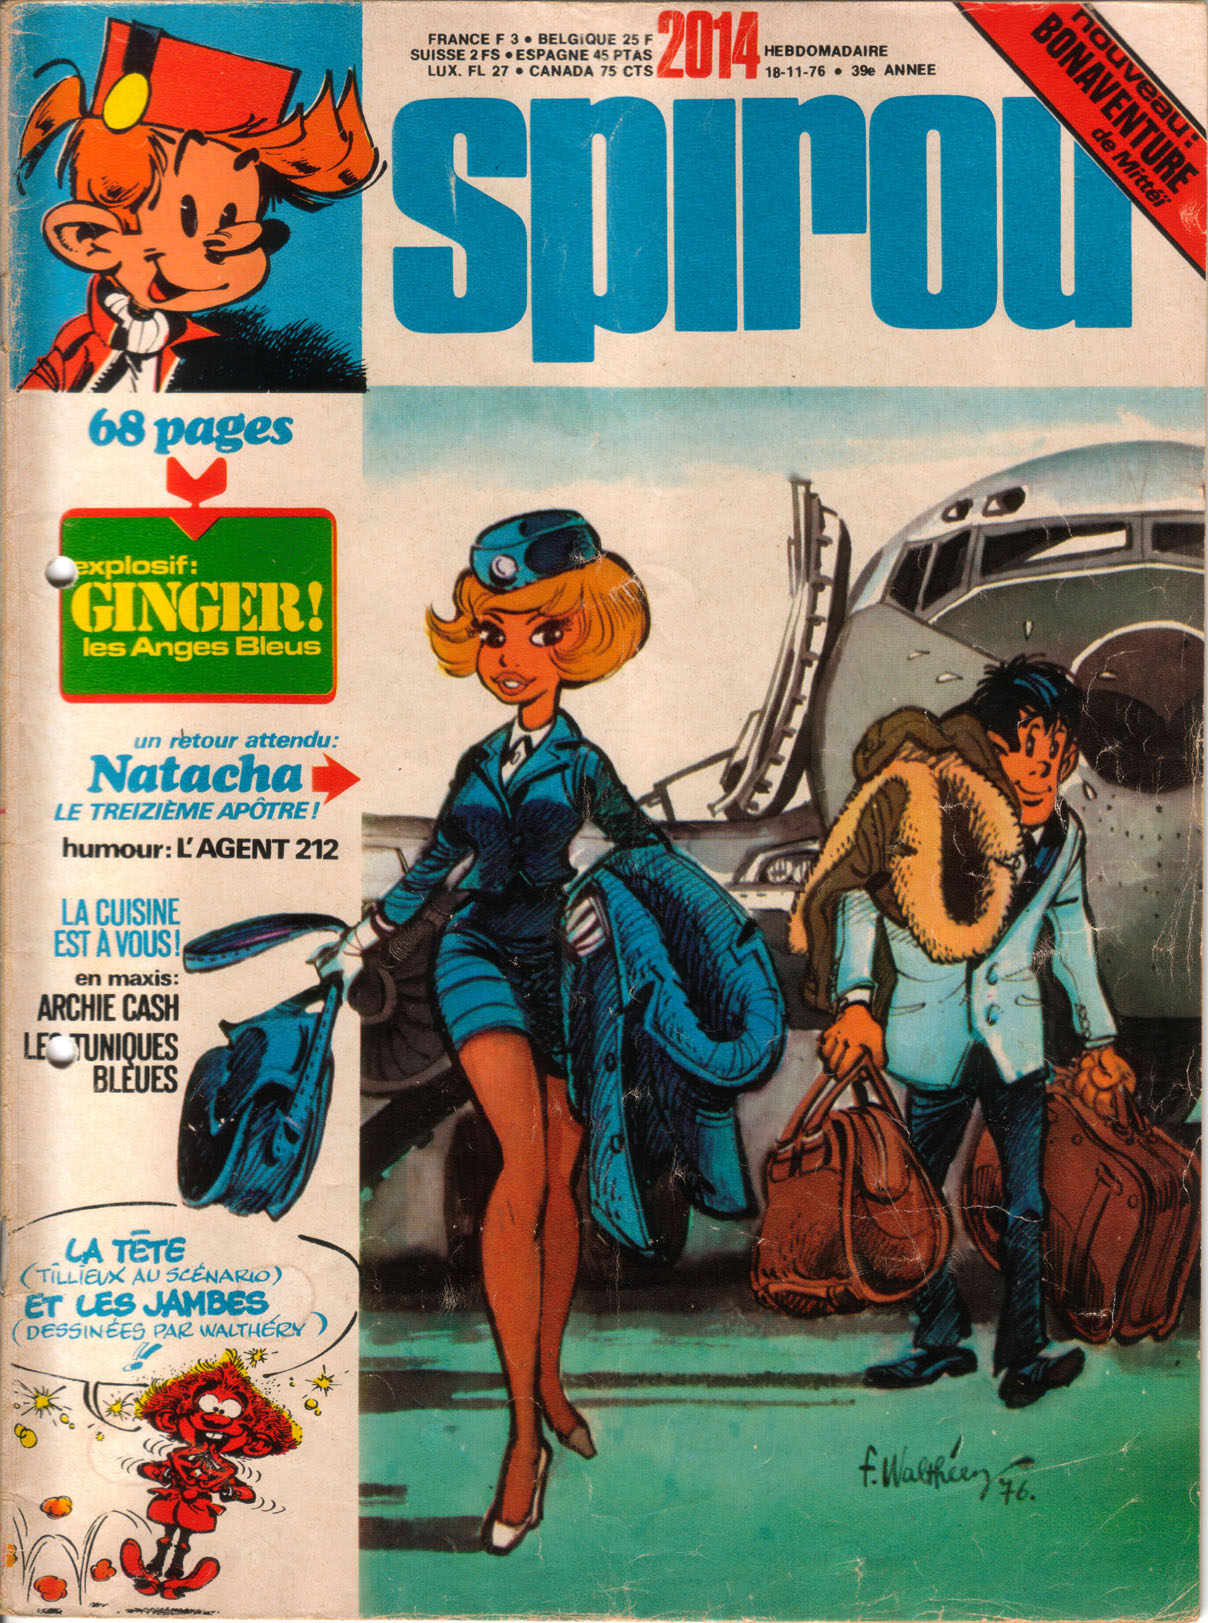 Spirou n°: 2014 du 18 novembre 1976